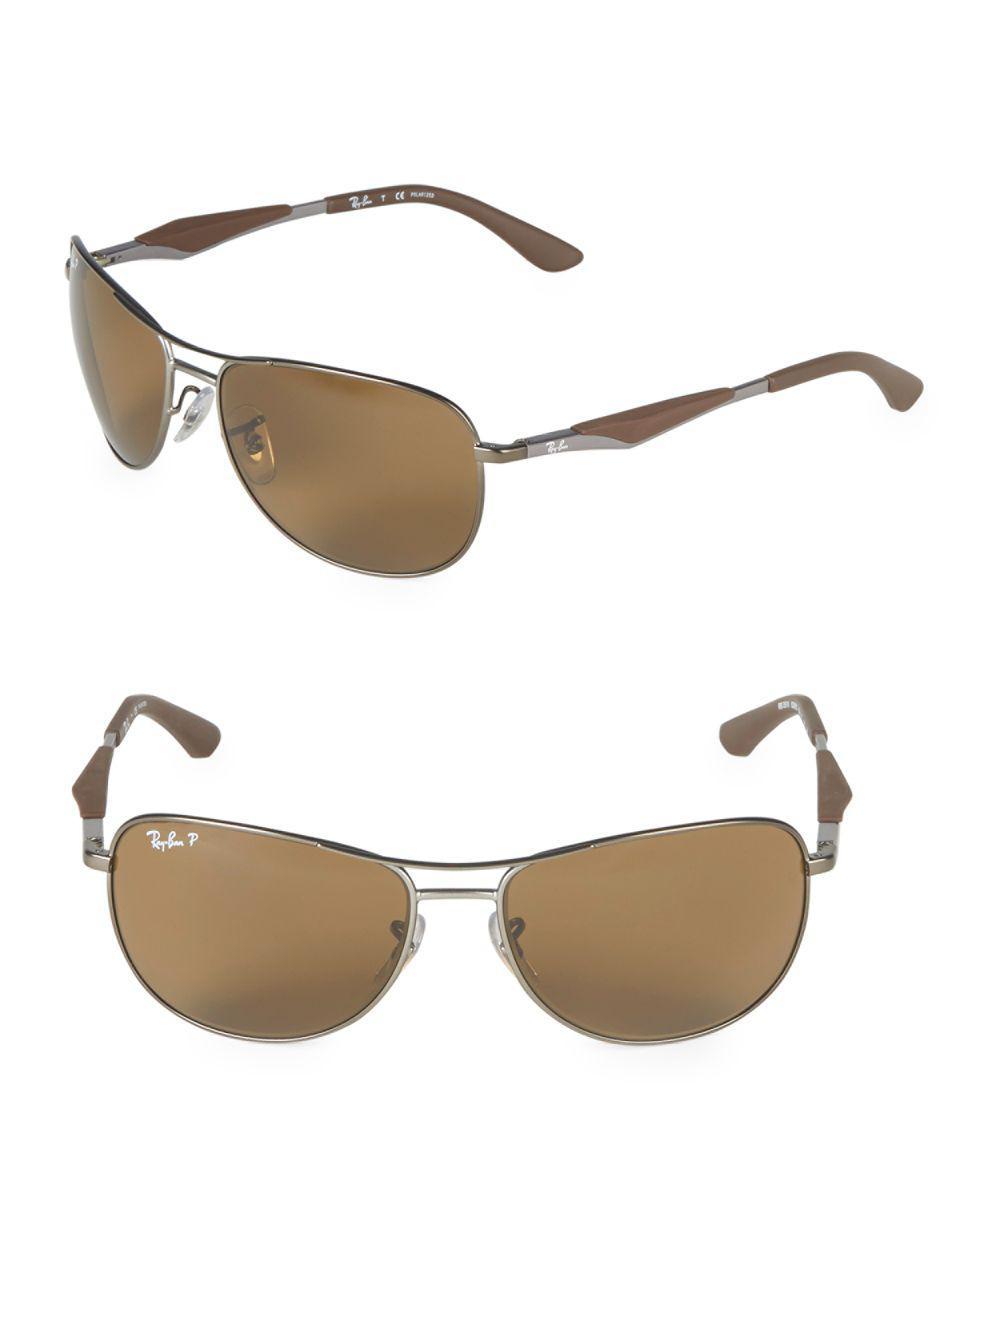 26fb0f7d19 Ray-Ban. Women s 59mm Classic Polarized Aviator Sunglasses